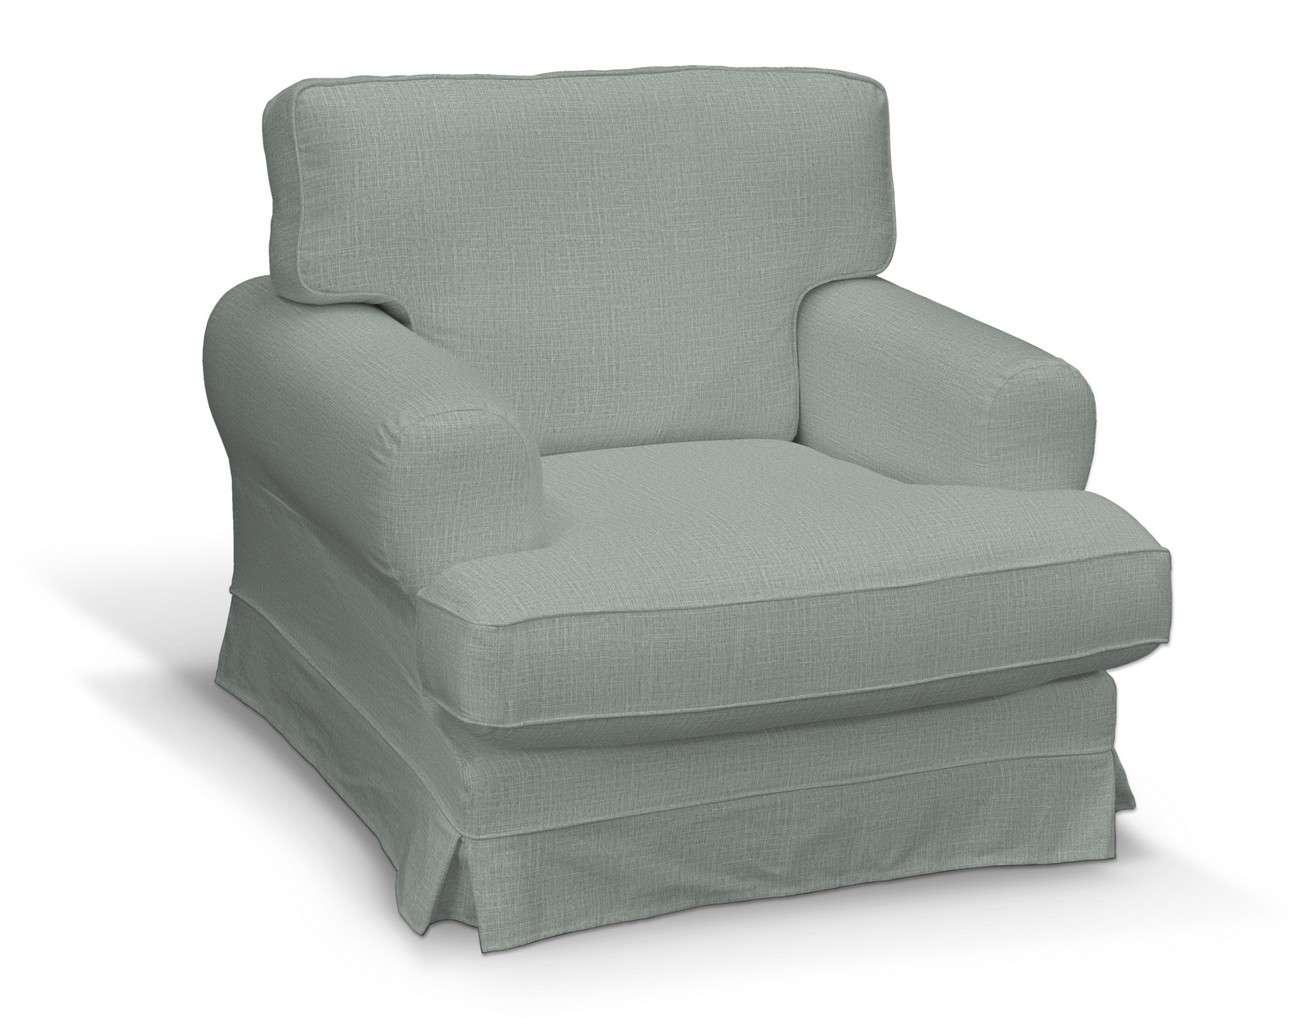 IKEA stoelhoes overtrek voor Ekeskog